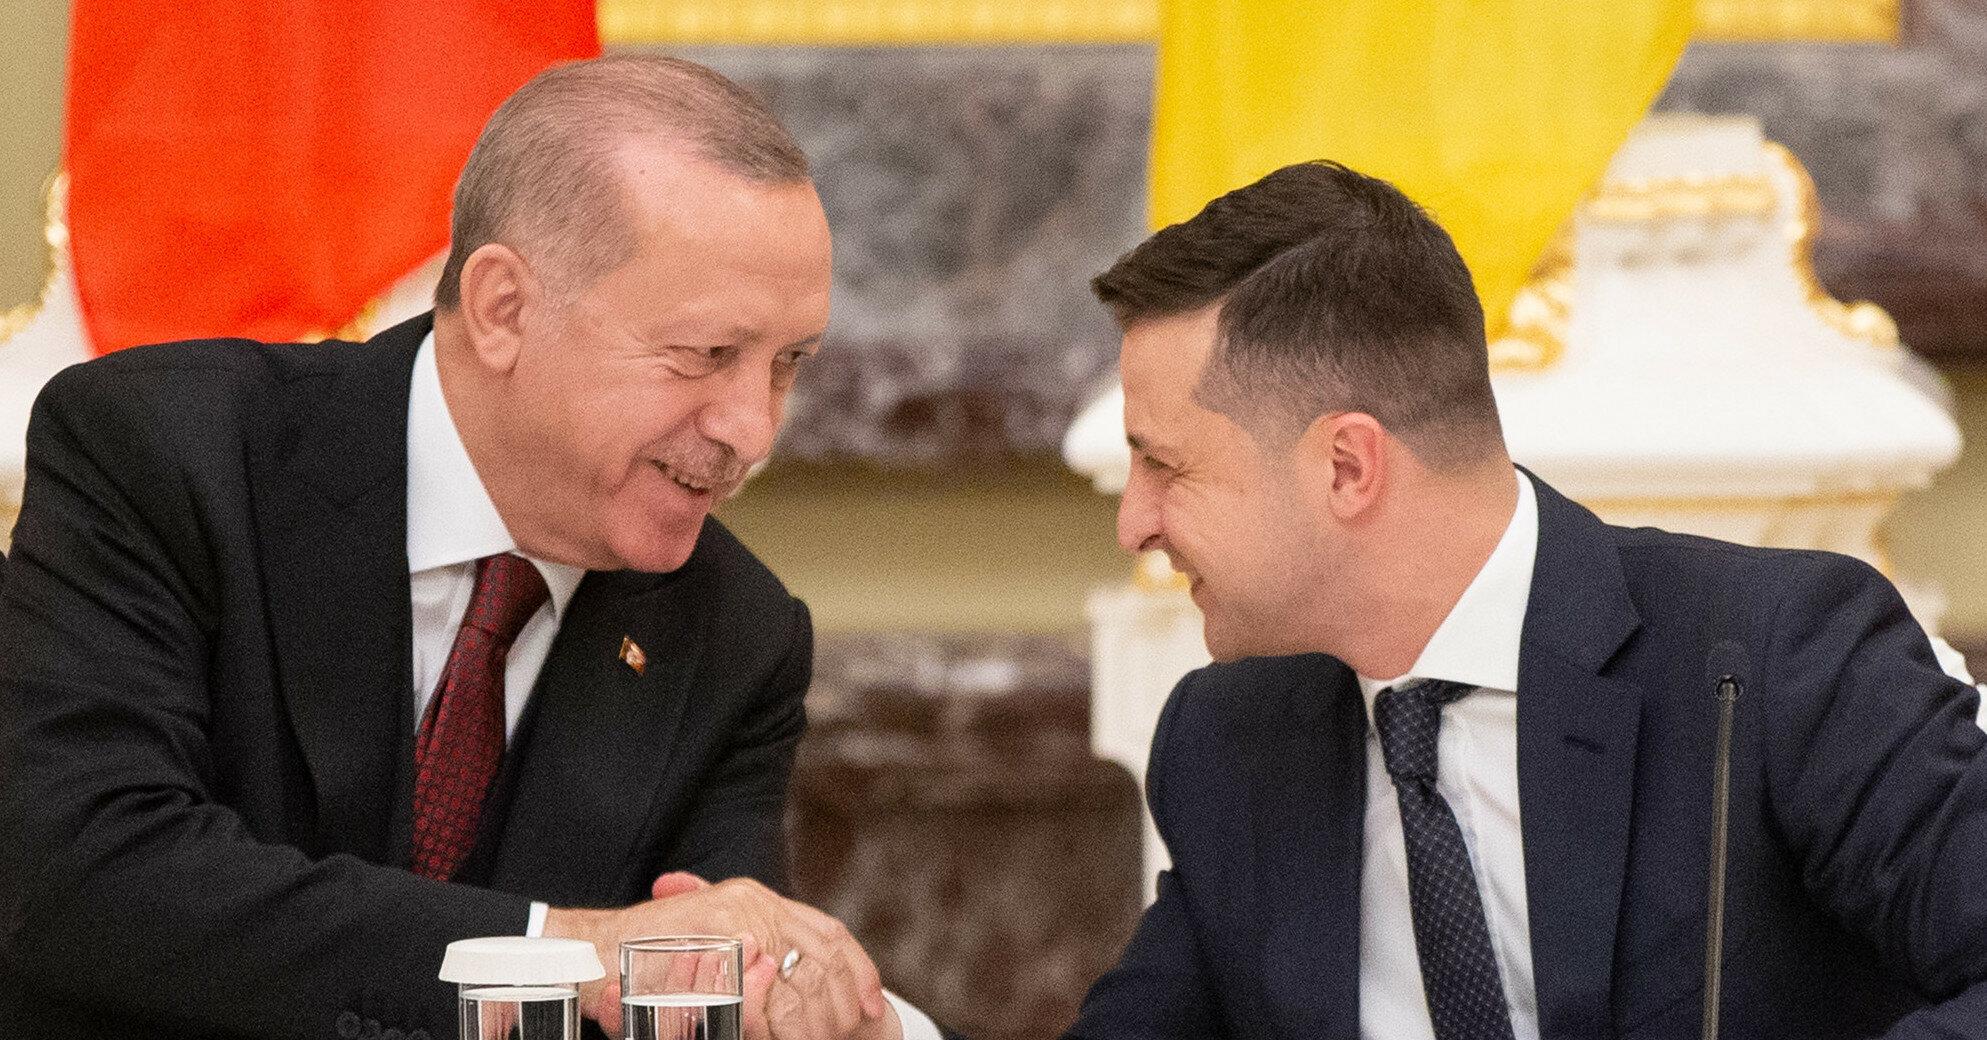 Эрдоган жаловался Зеленскому на шантаж со стороны Путина